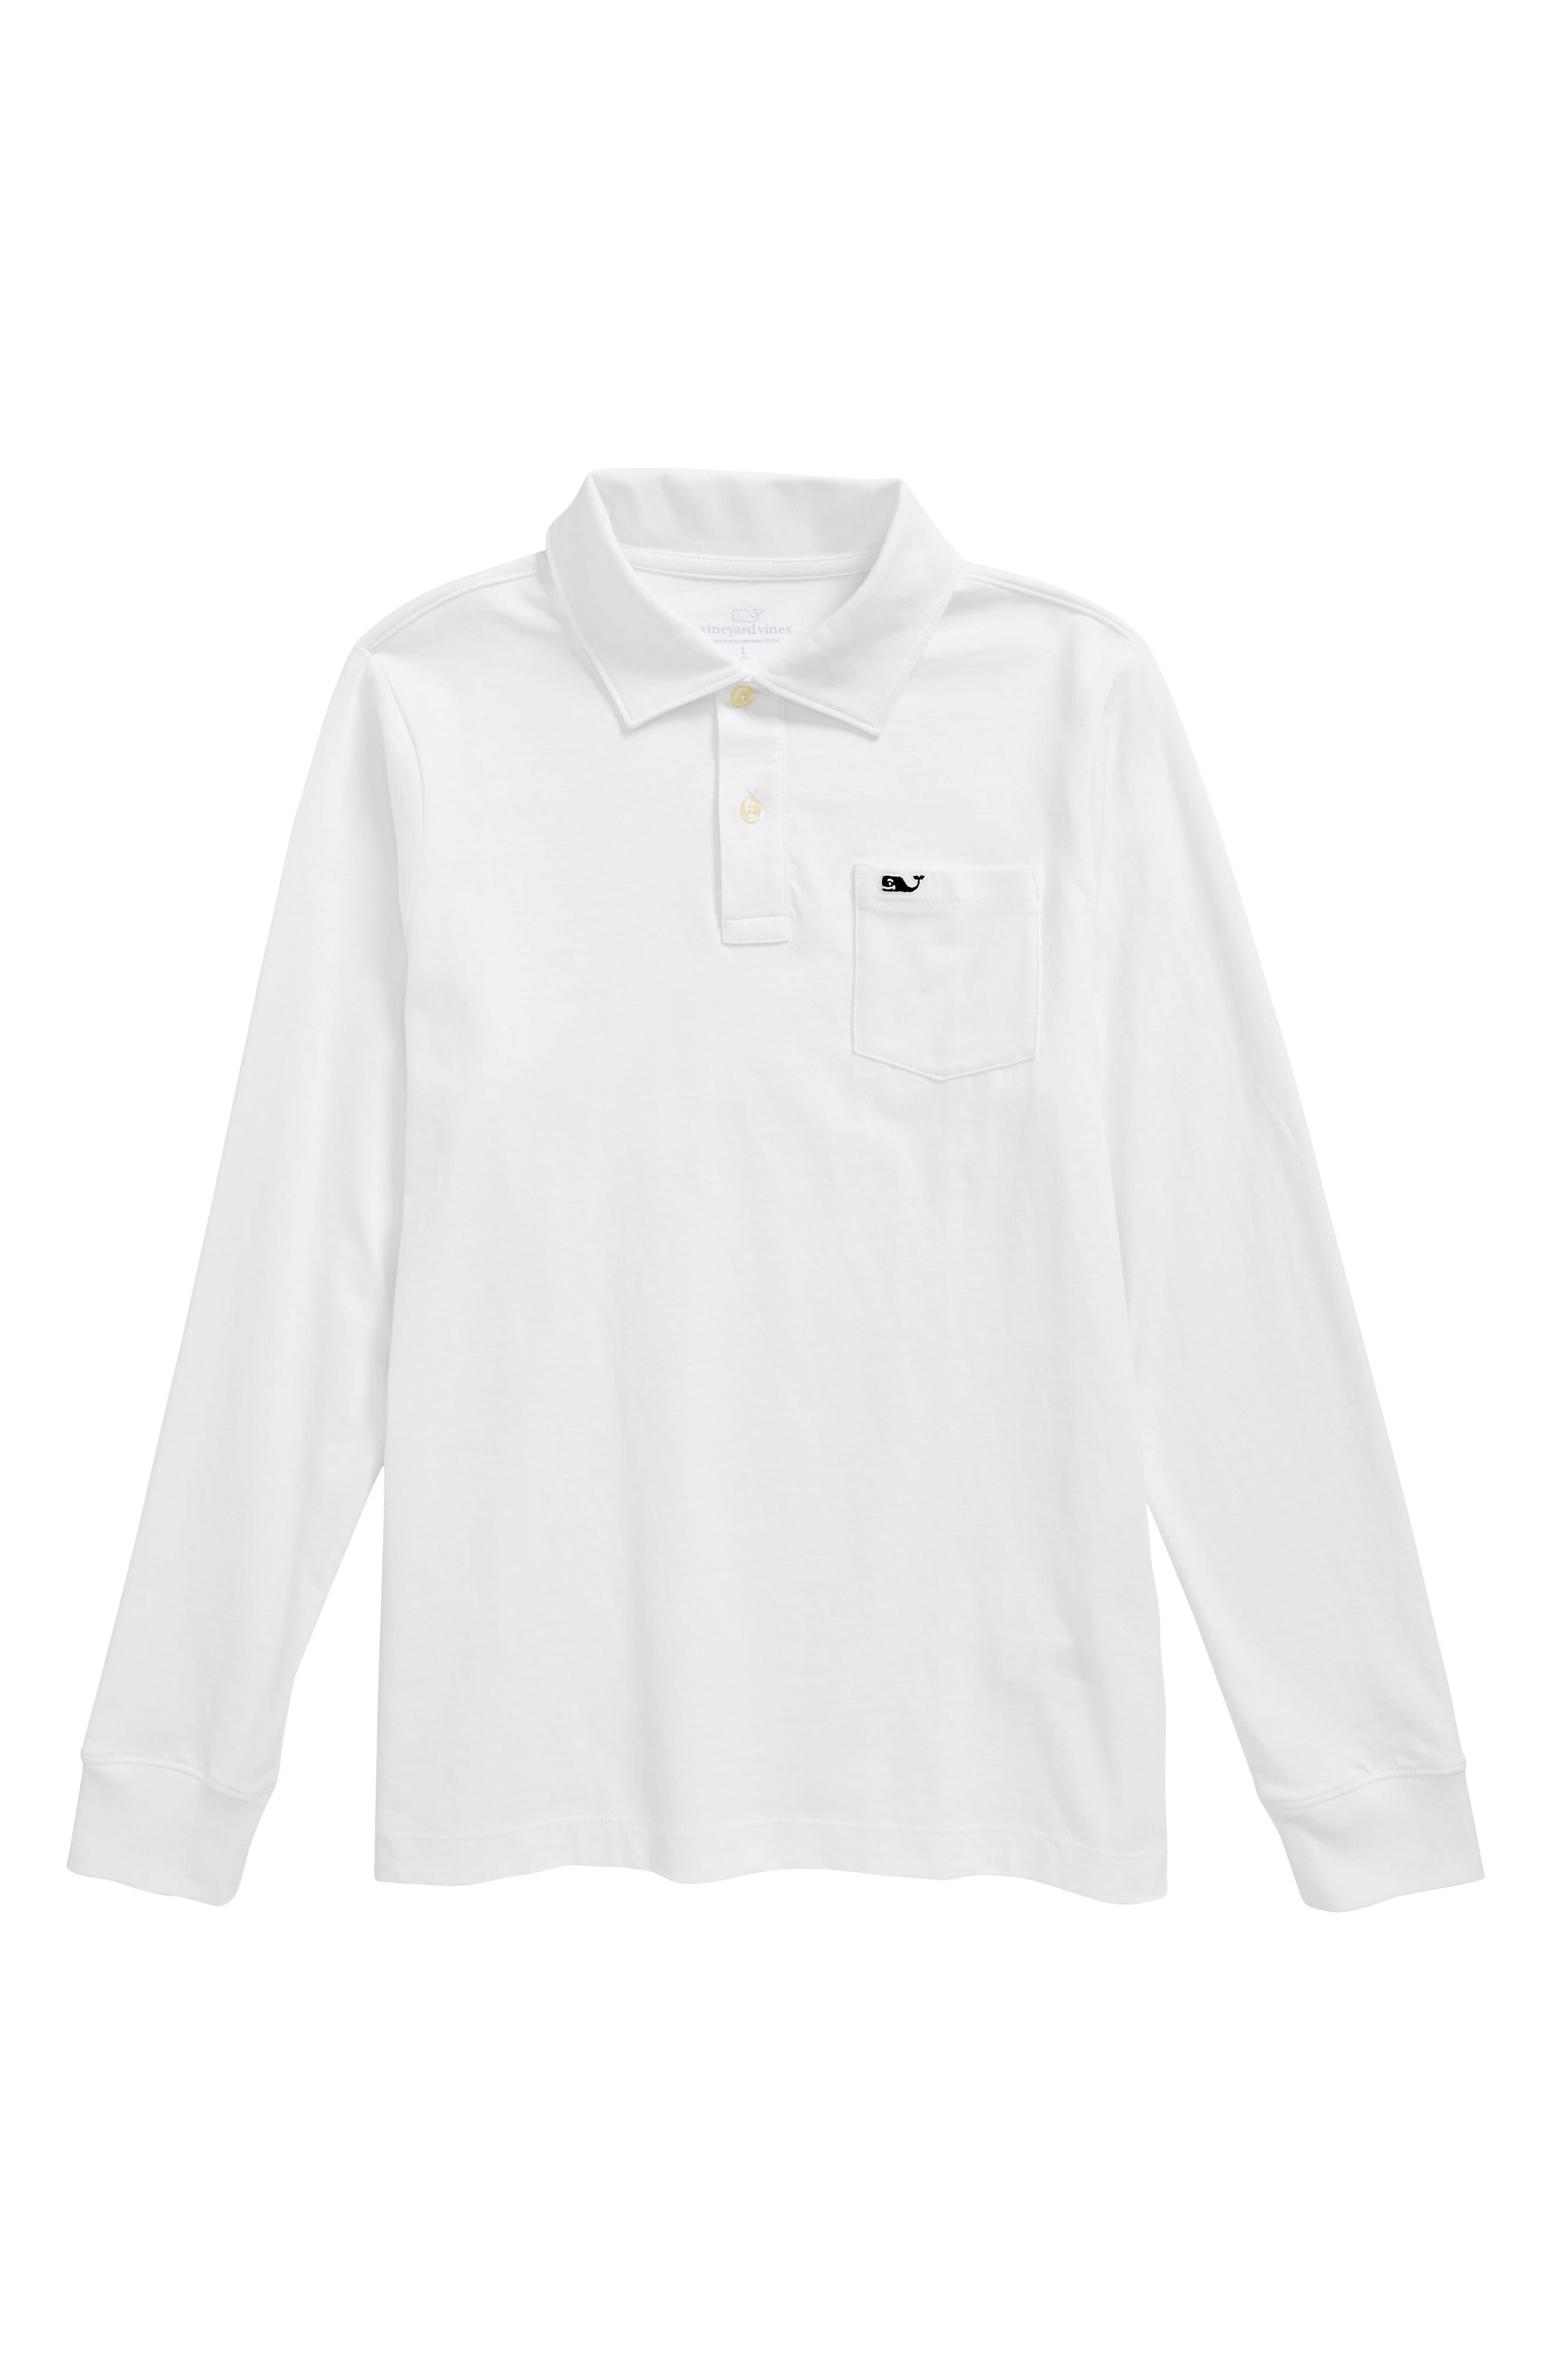 Pima Cotton Jersey Polo,                         Main,                         color, 100